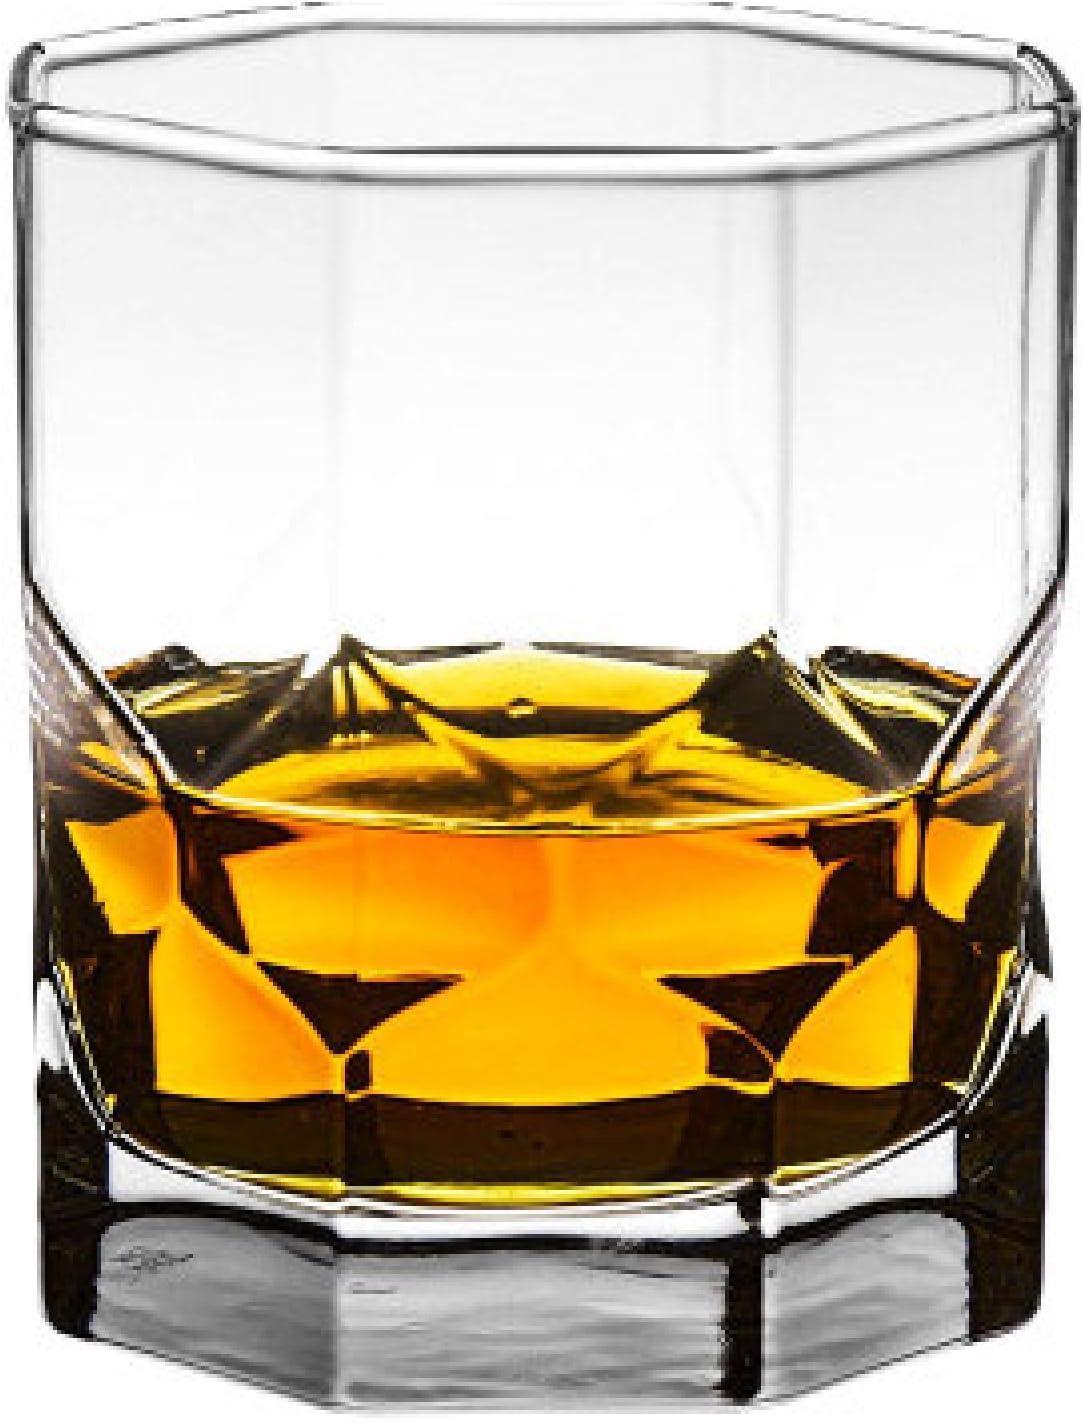 XMYZ 1 Uds Vasos de Whisky de Moda, Whisky, Bourbon, cócteles ...